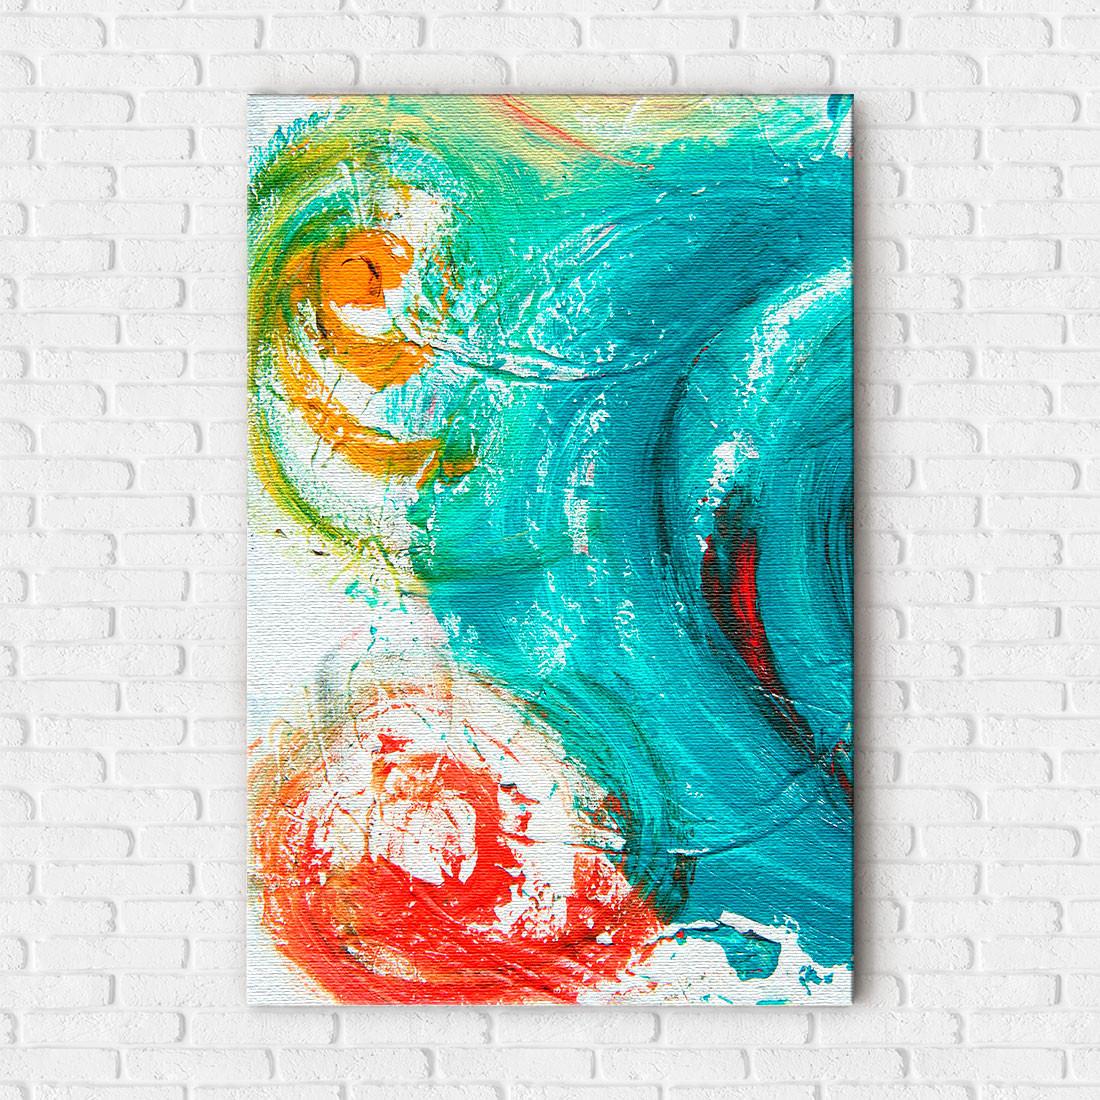 Quadro Decorativo Pintura Abstrata Espiral